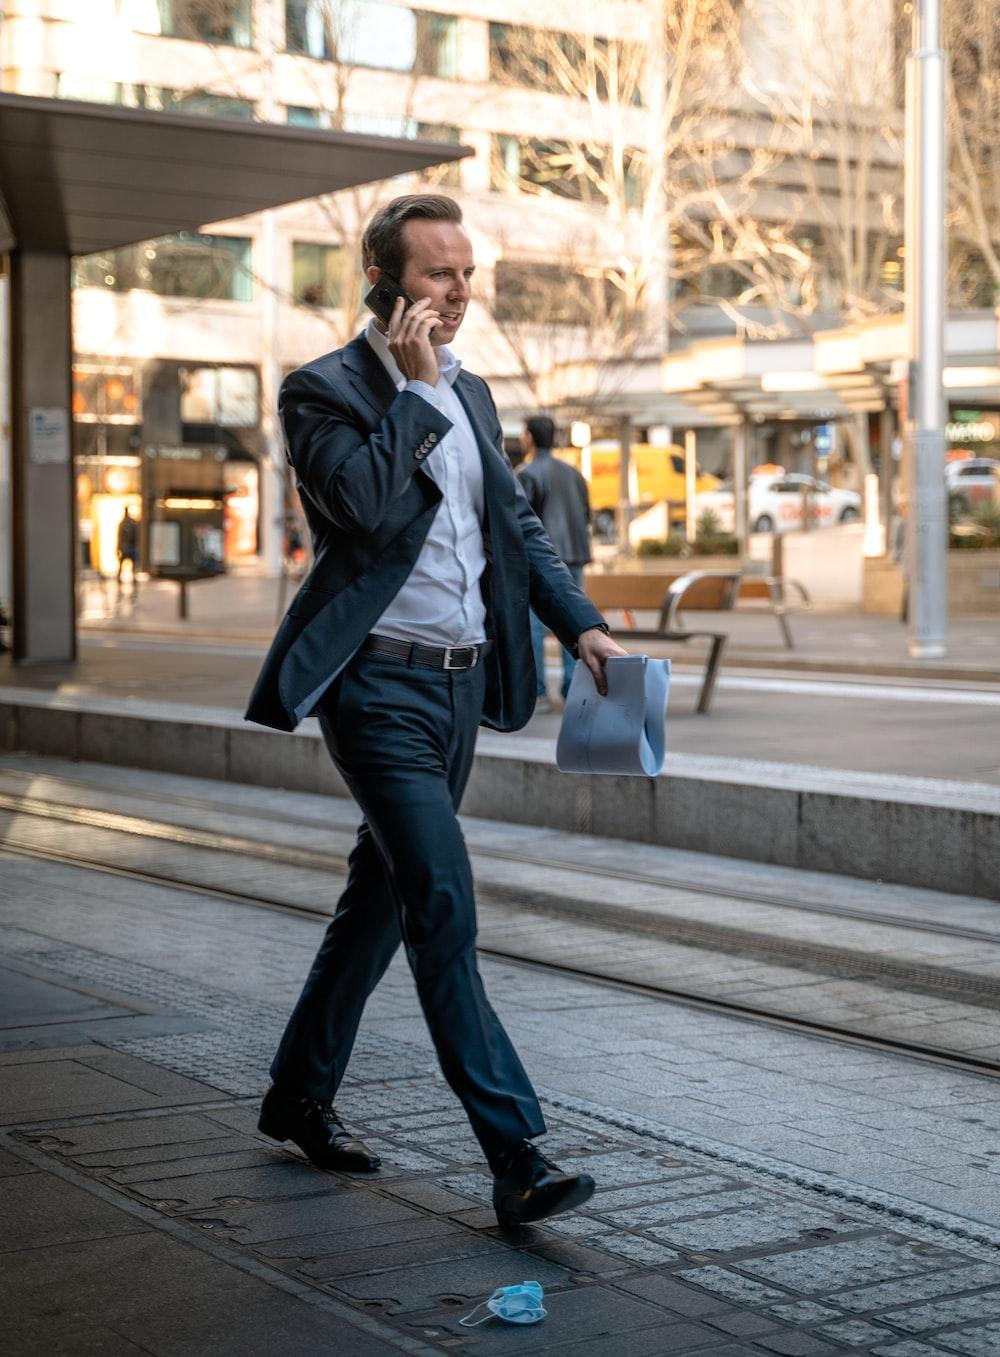 man in black leather jacket and blue denim jeans standing on sidewalk during daytime